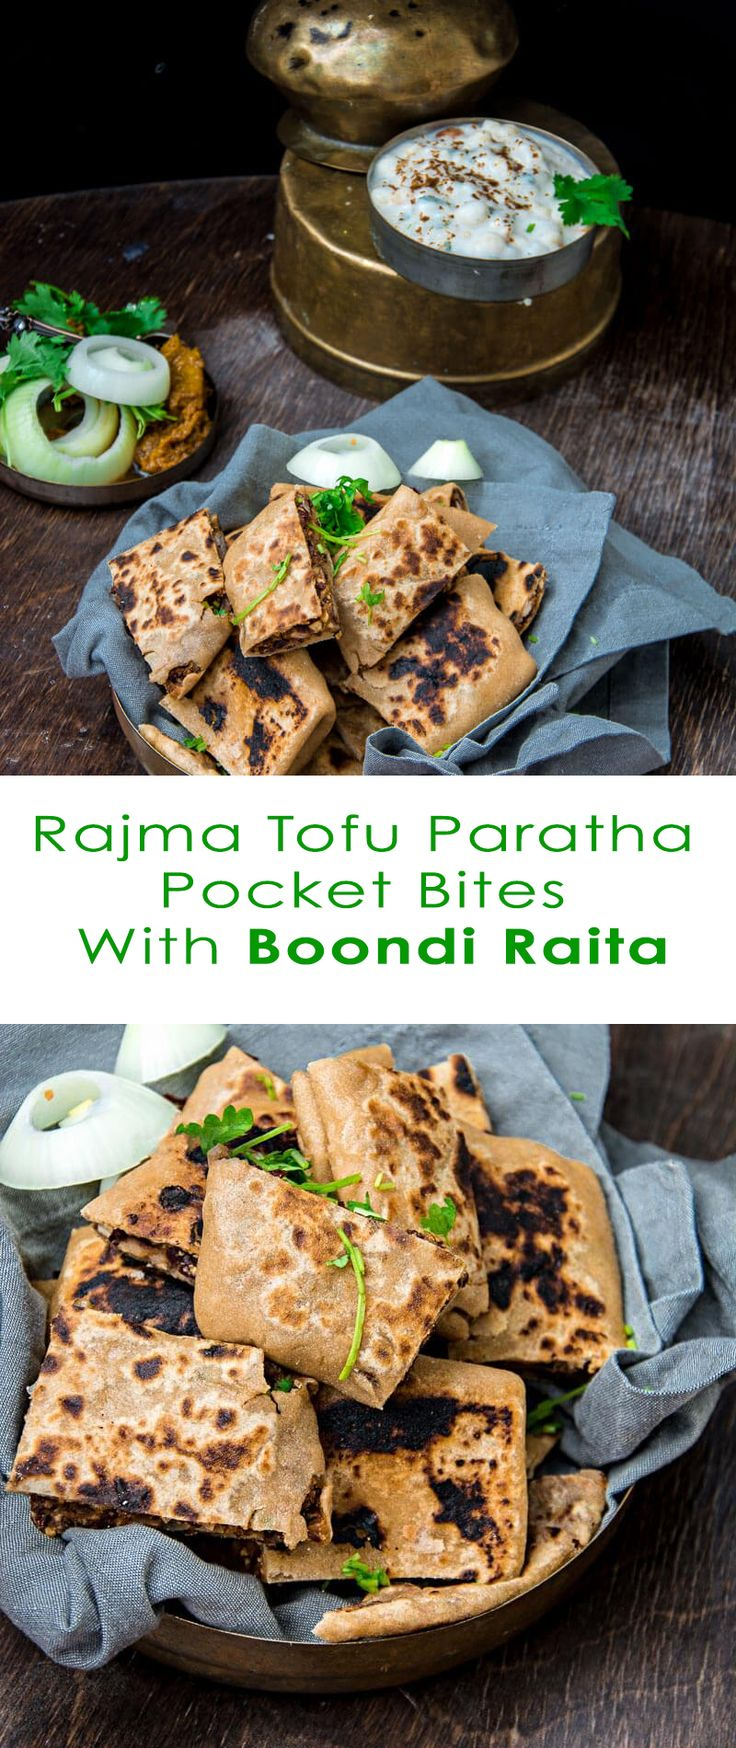 Rajma Tofu Paratha Pockets With Boondi Raita | mygingergarlickitchen.com…